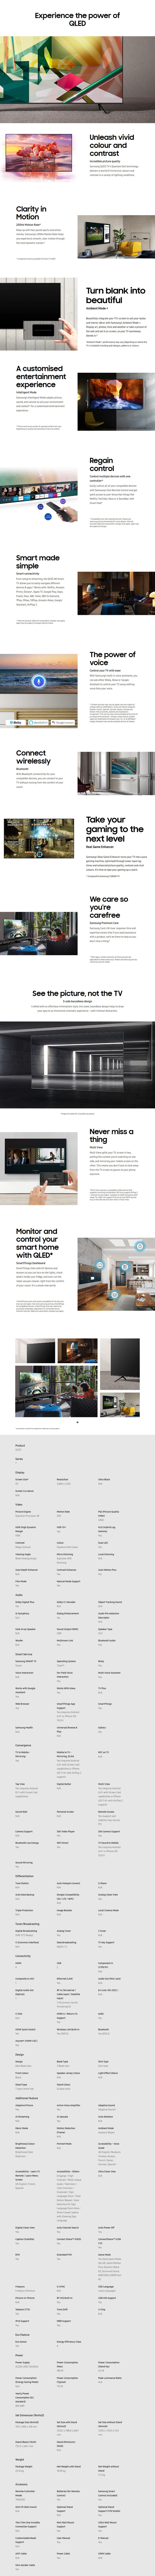 "Samsung Series Q70T 55"" 200Hz 4K UHD QLED TV - 2020 Model - Overview 1"